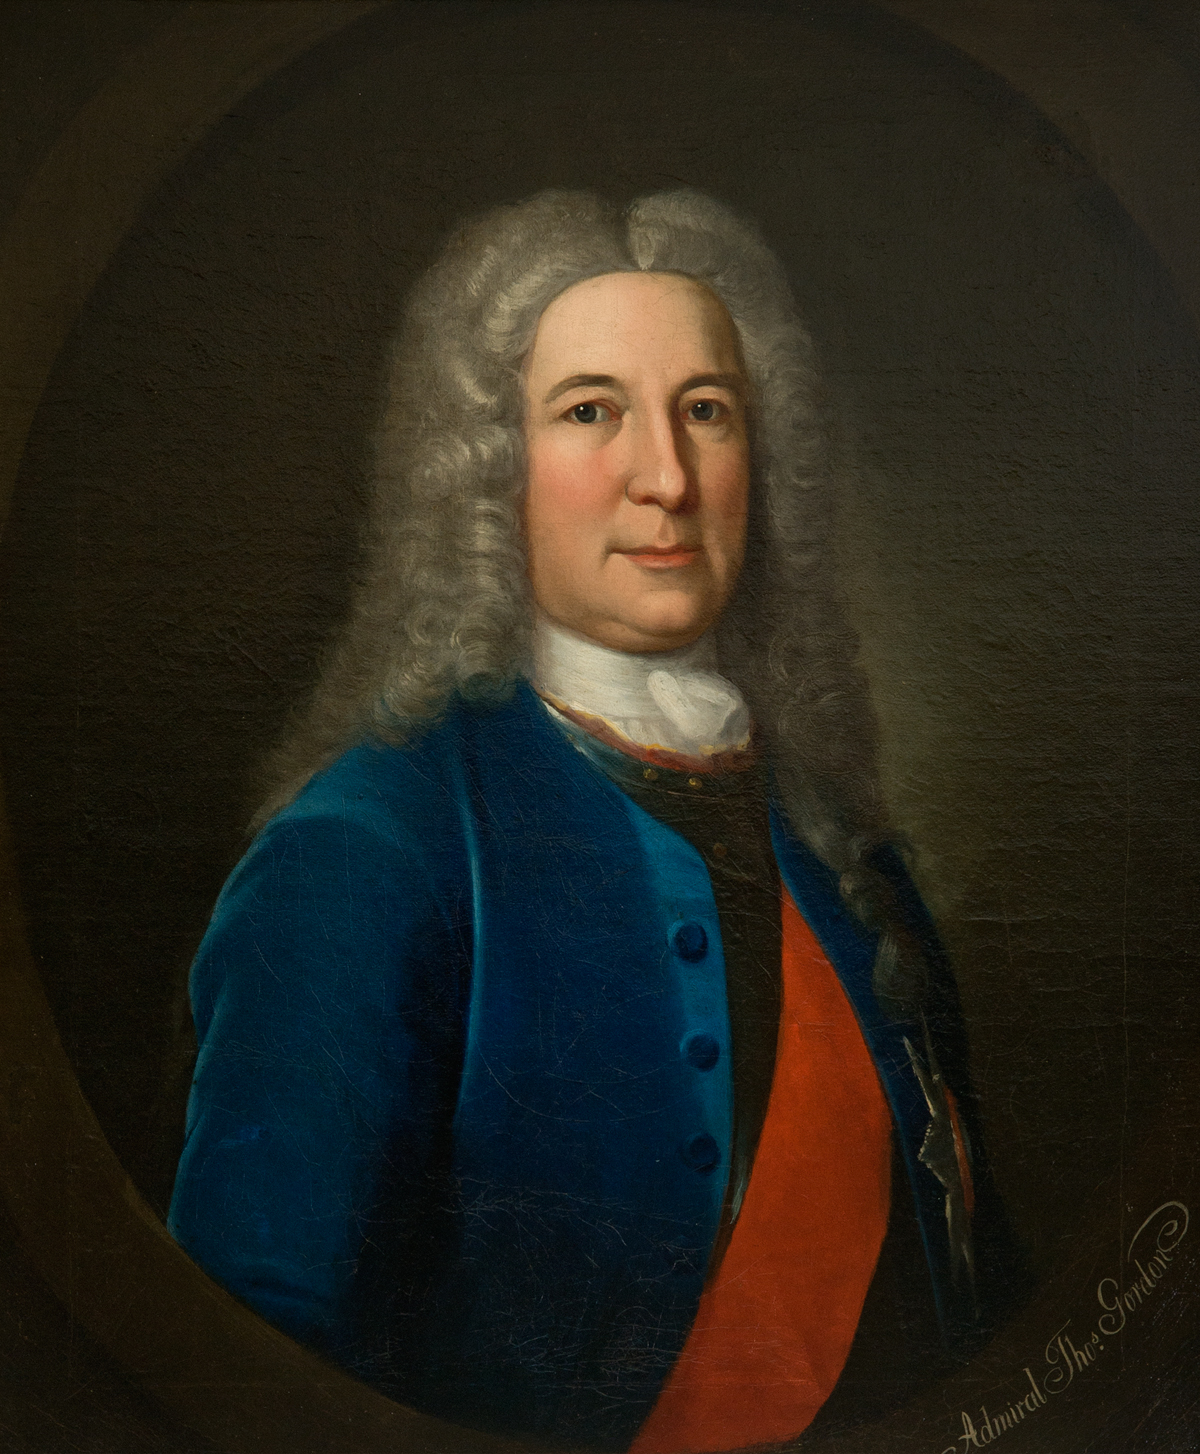 https://upload.wikimedia.org/wikipedia/commons/1/1b/Thomas_Gordon_admiral.jpg